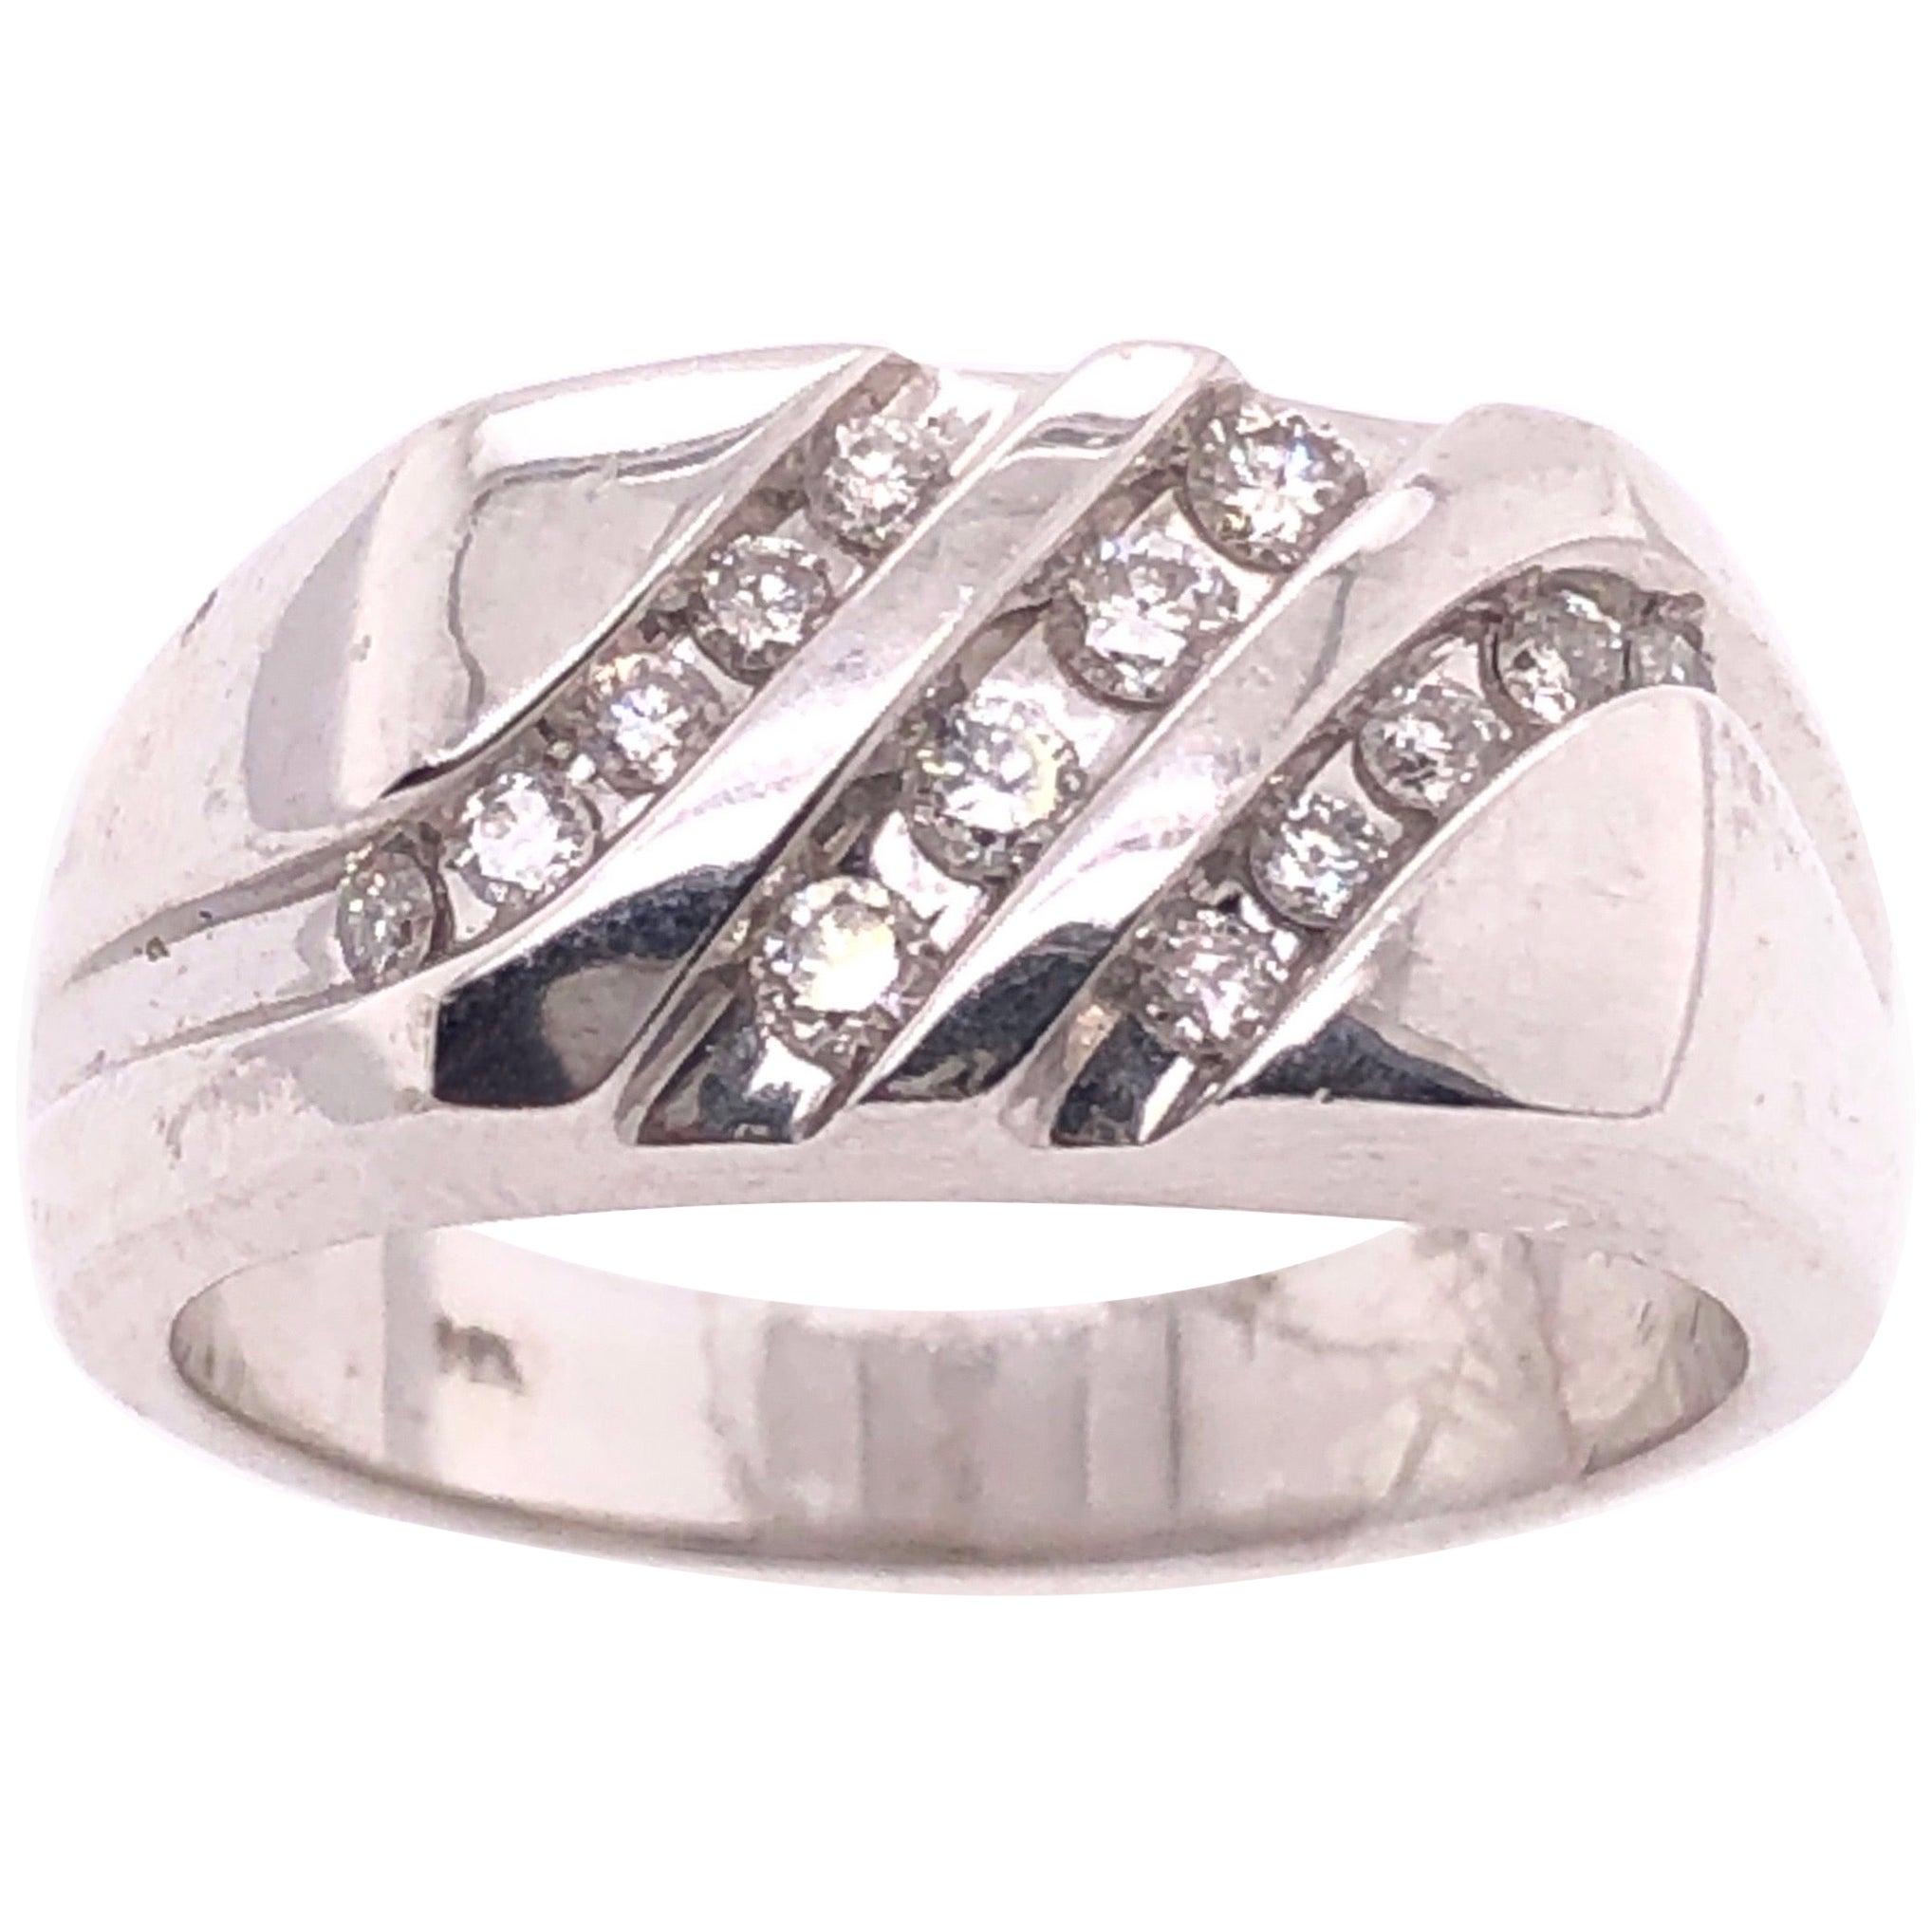 14 Karat White Gold Contemporary Three-Row Diamond Ring Band